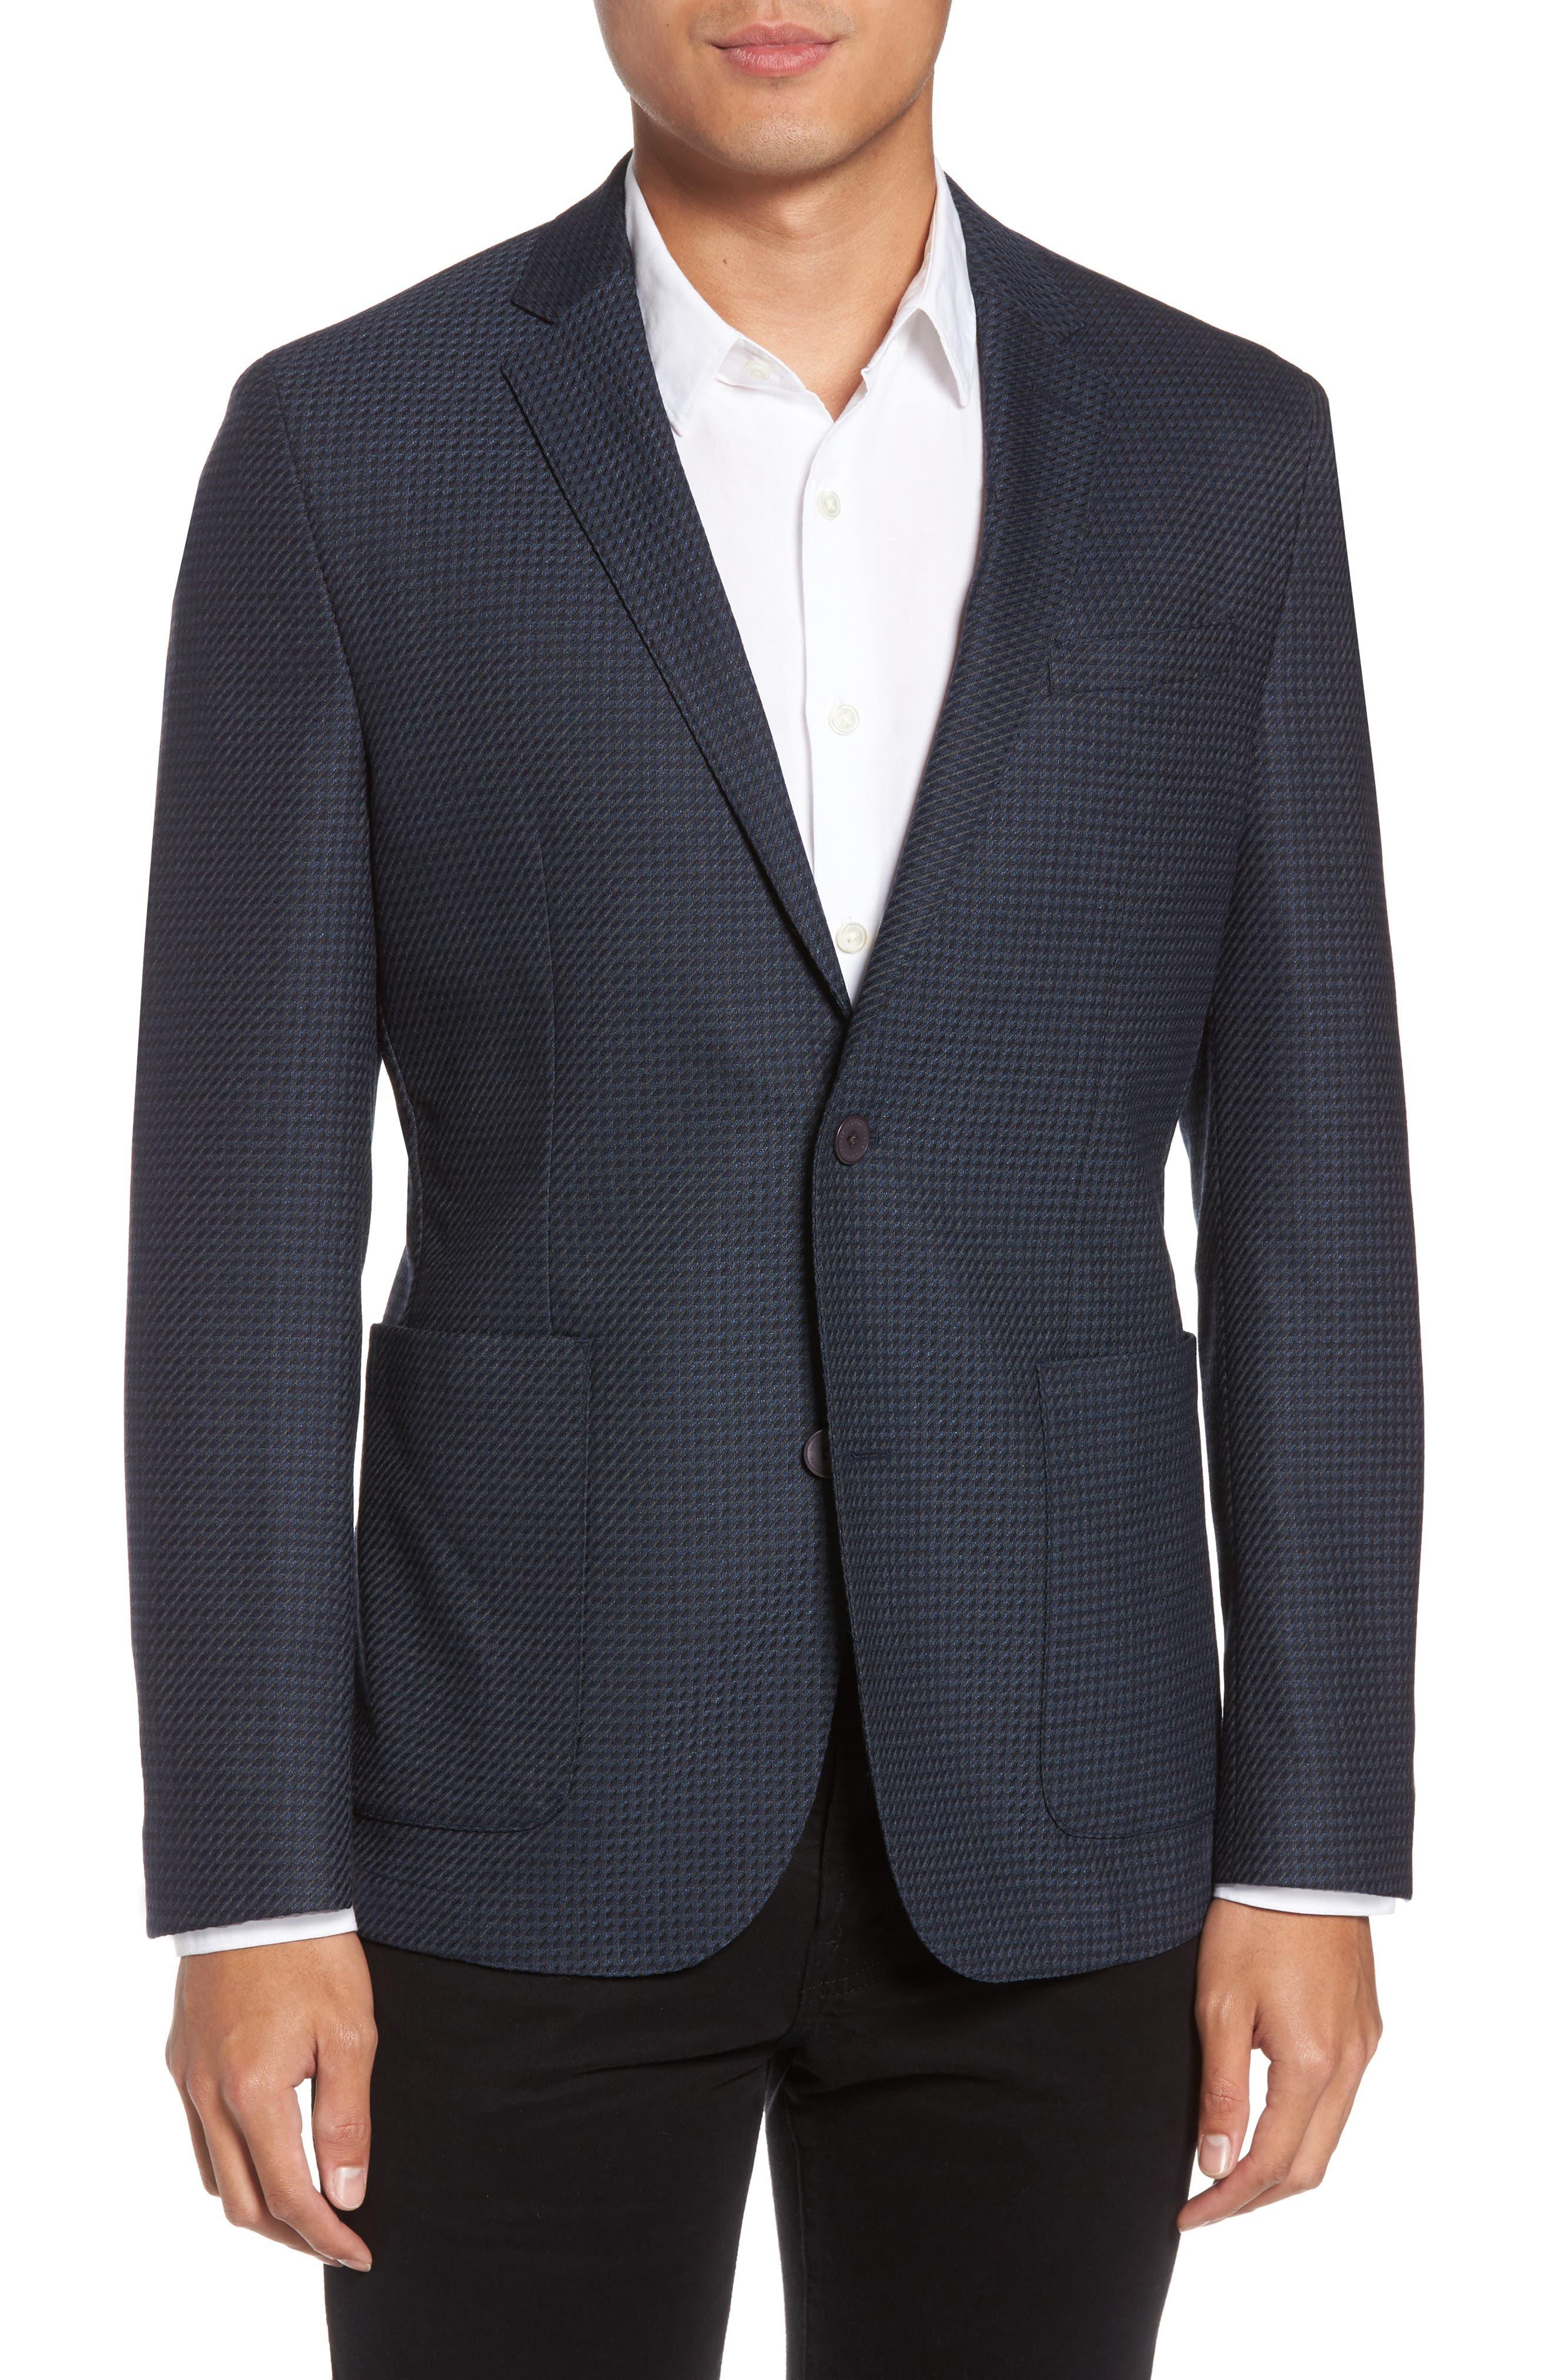 Main Image - Vince Camuto Digital Houndstooth Wool Blend Sport Coat